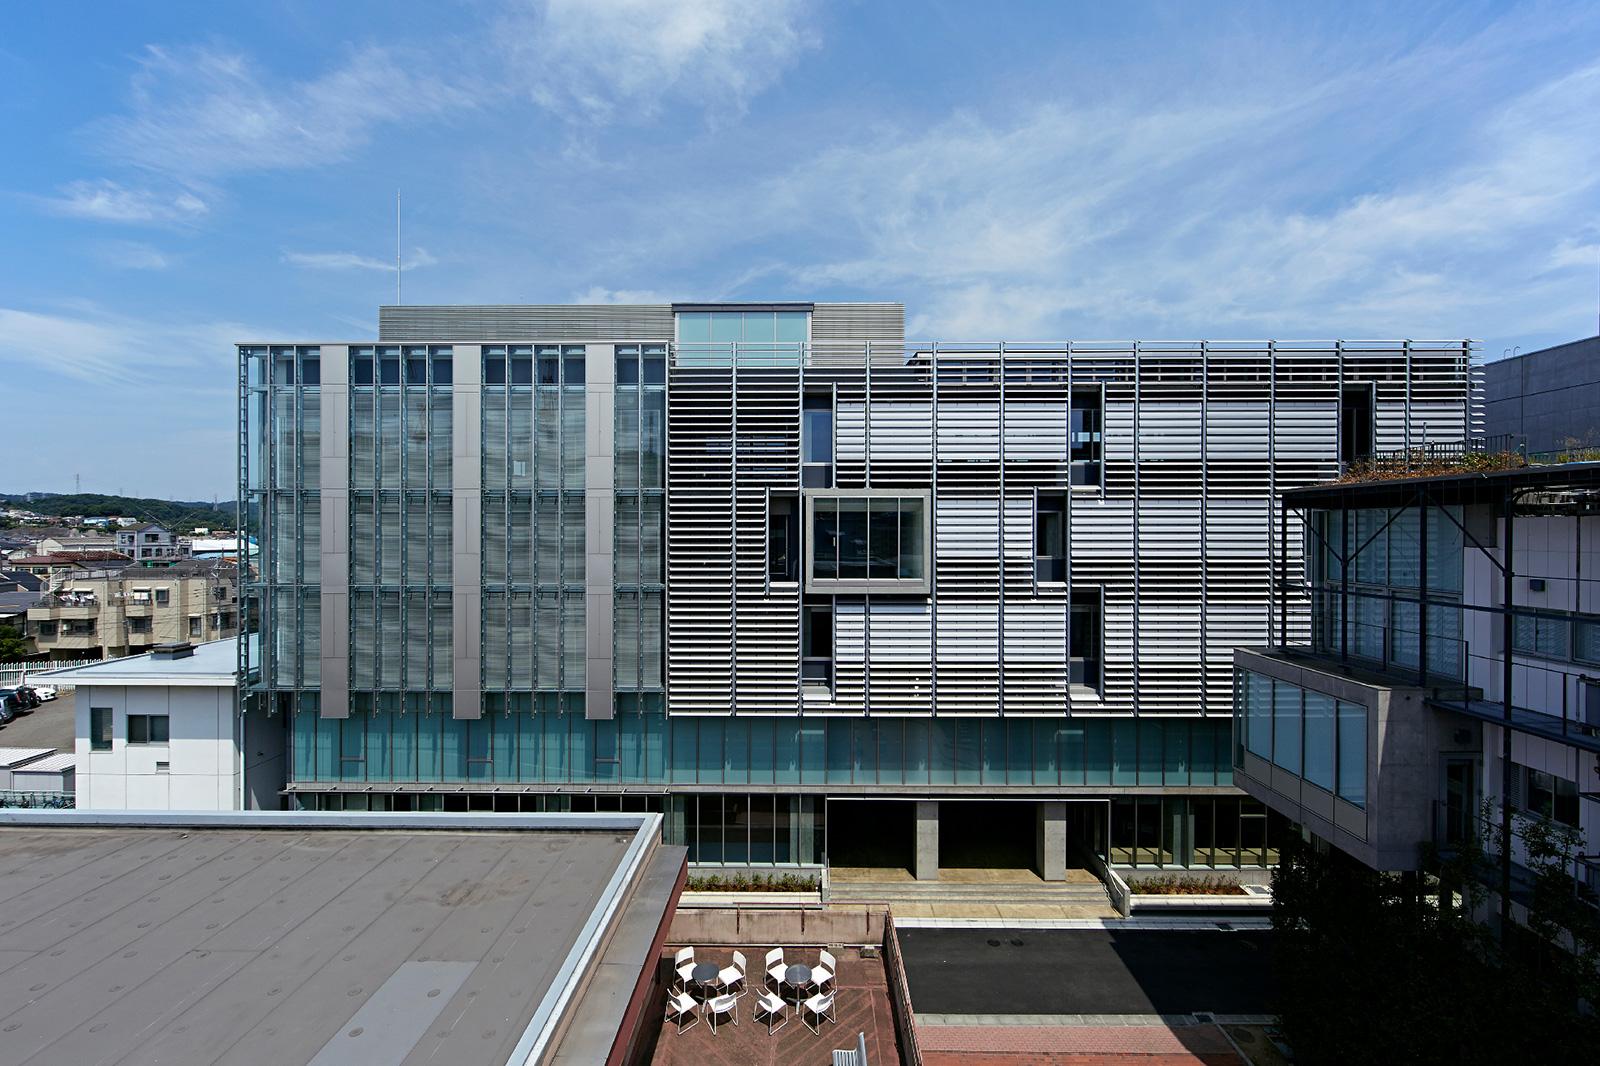 関東学院大学金沢八景キャンパス 5号館(建築・環境棟)